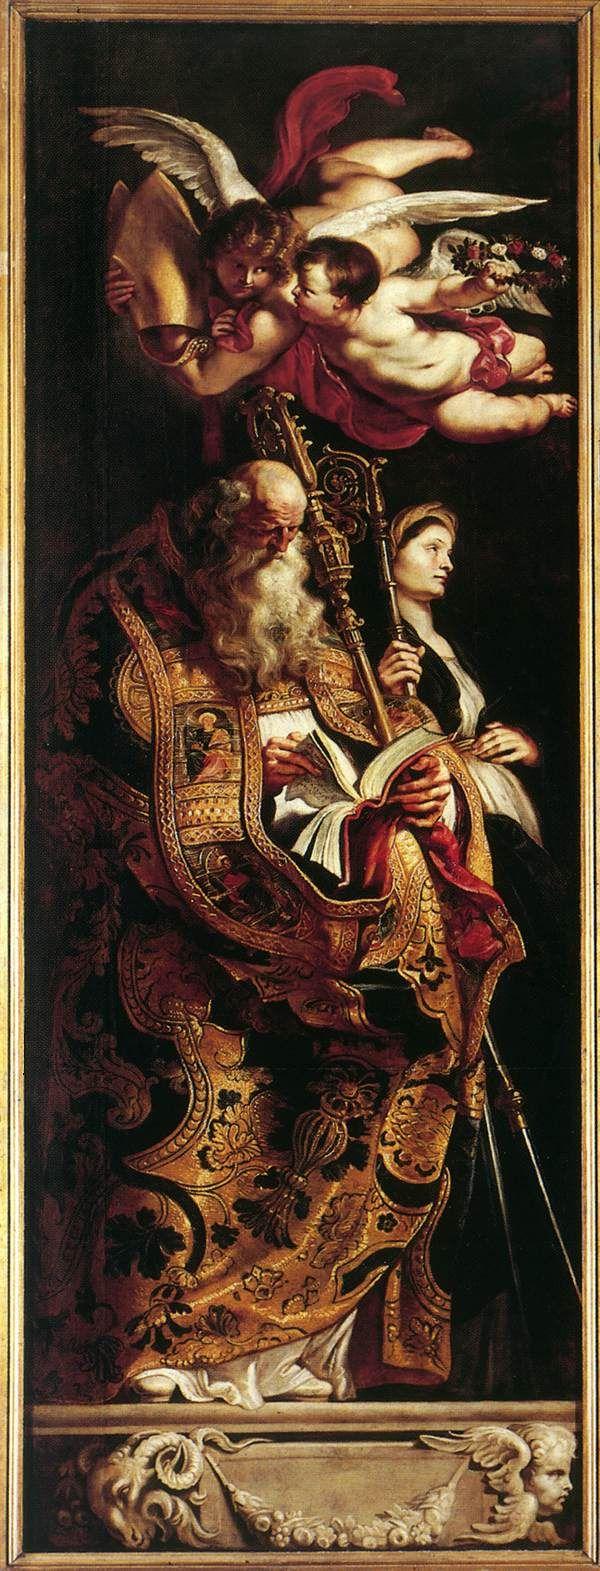 Peter Paul Rubens: Raising of the Cross [detail: Sts Amand and Walpurgis]